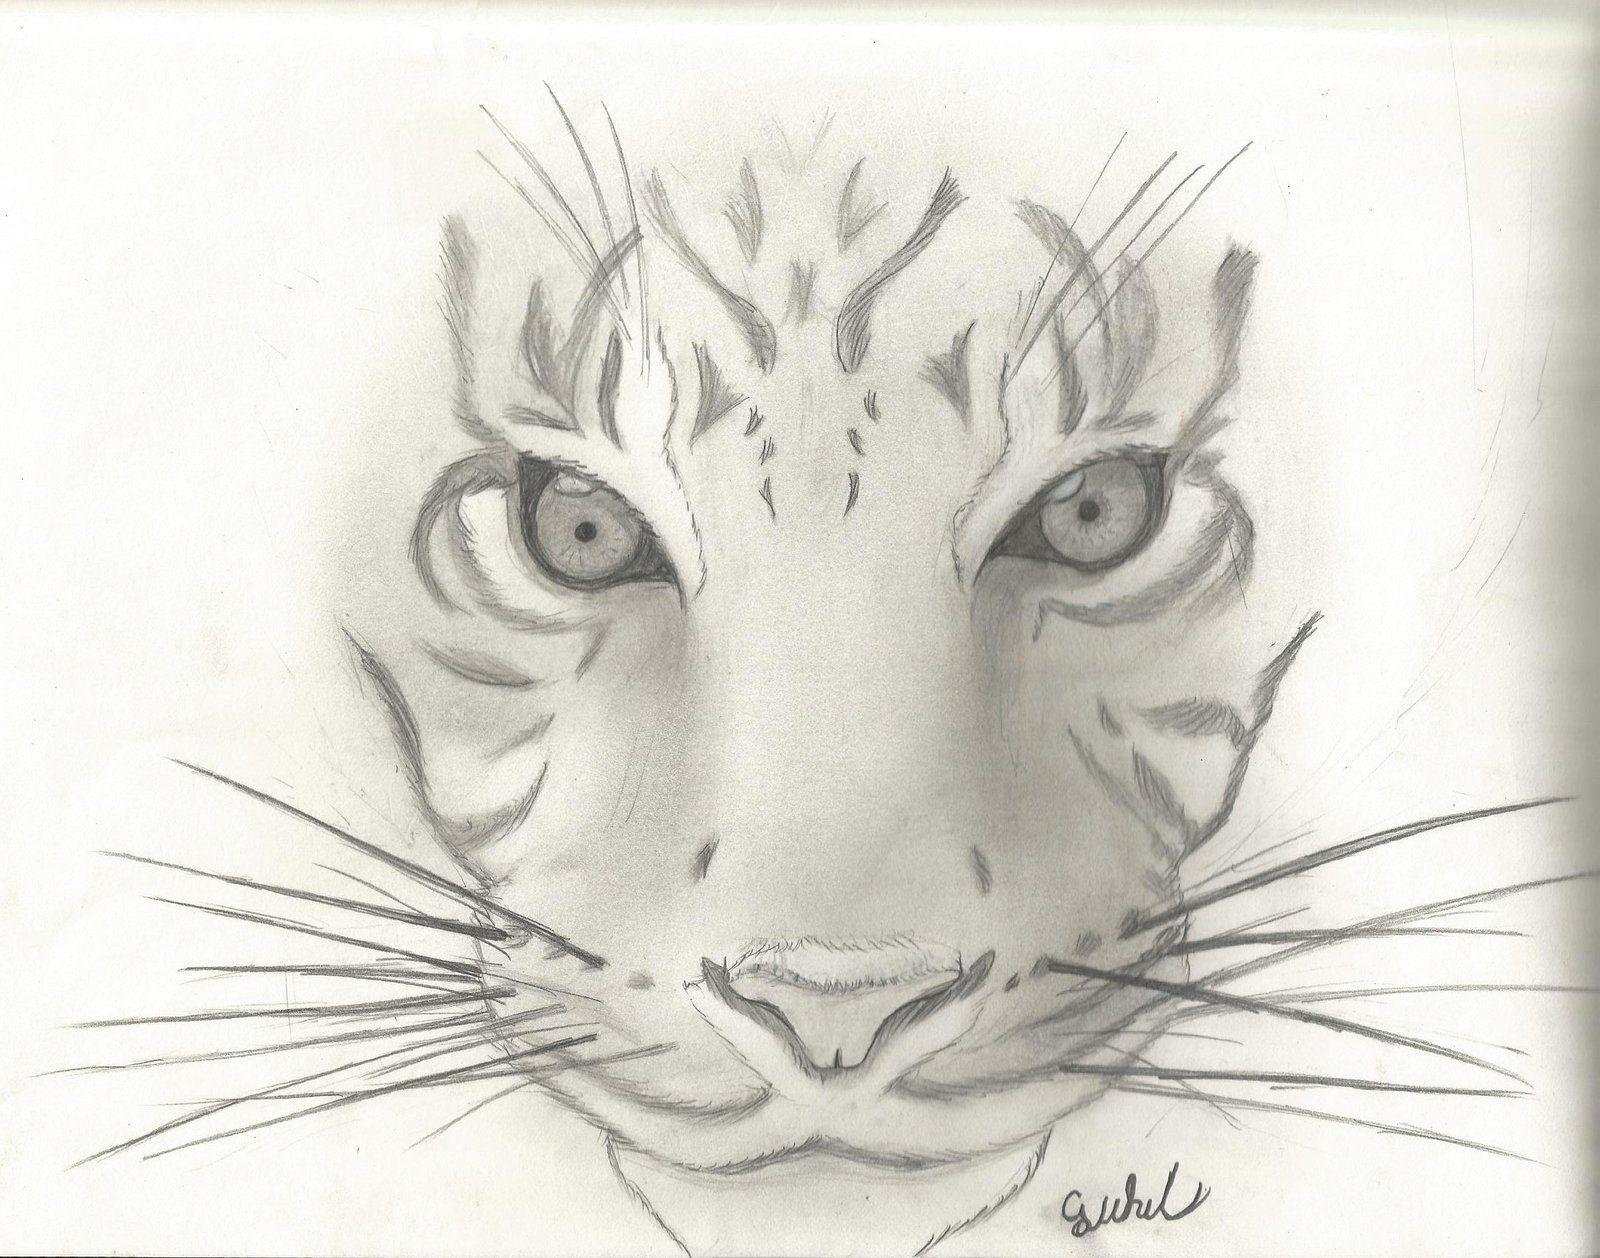 Uncategorized Drawings Of Animal animal sketch 1 tiger by cjwhit on deviantart sketches deviantart